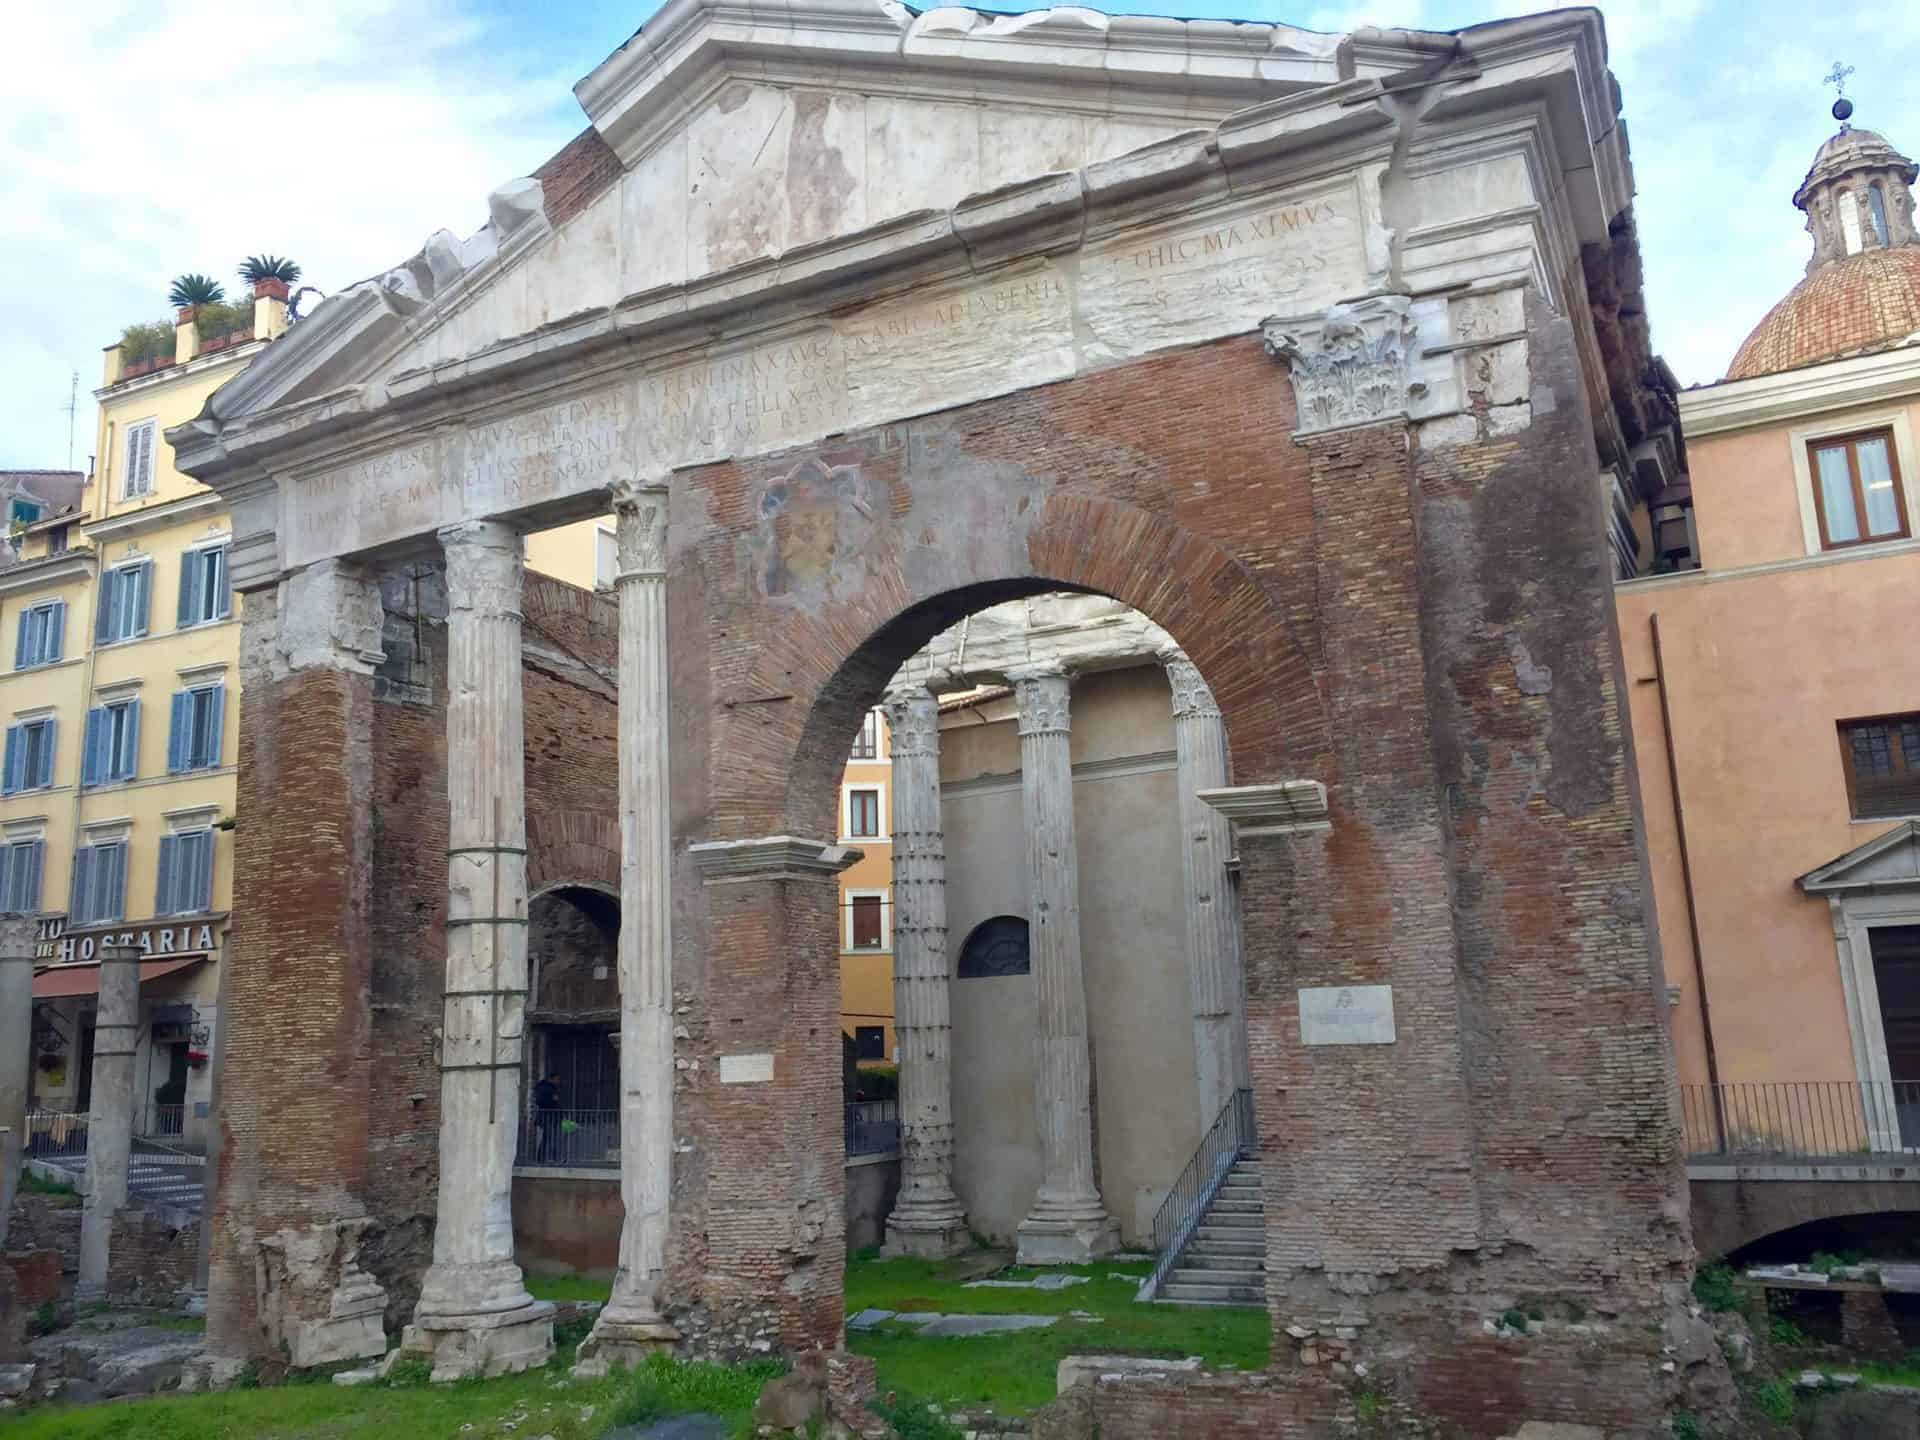 rome_fromcapitoline2) Portico of Octavia